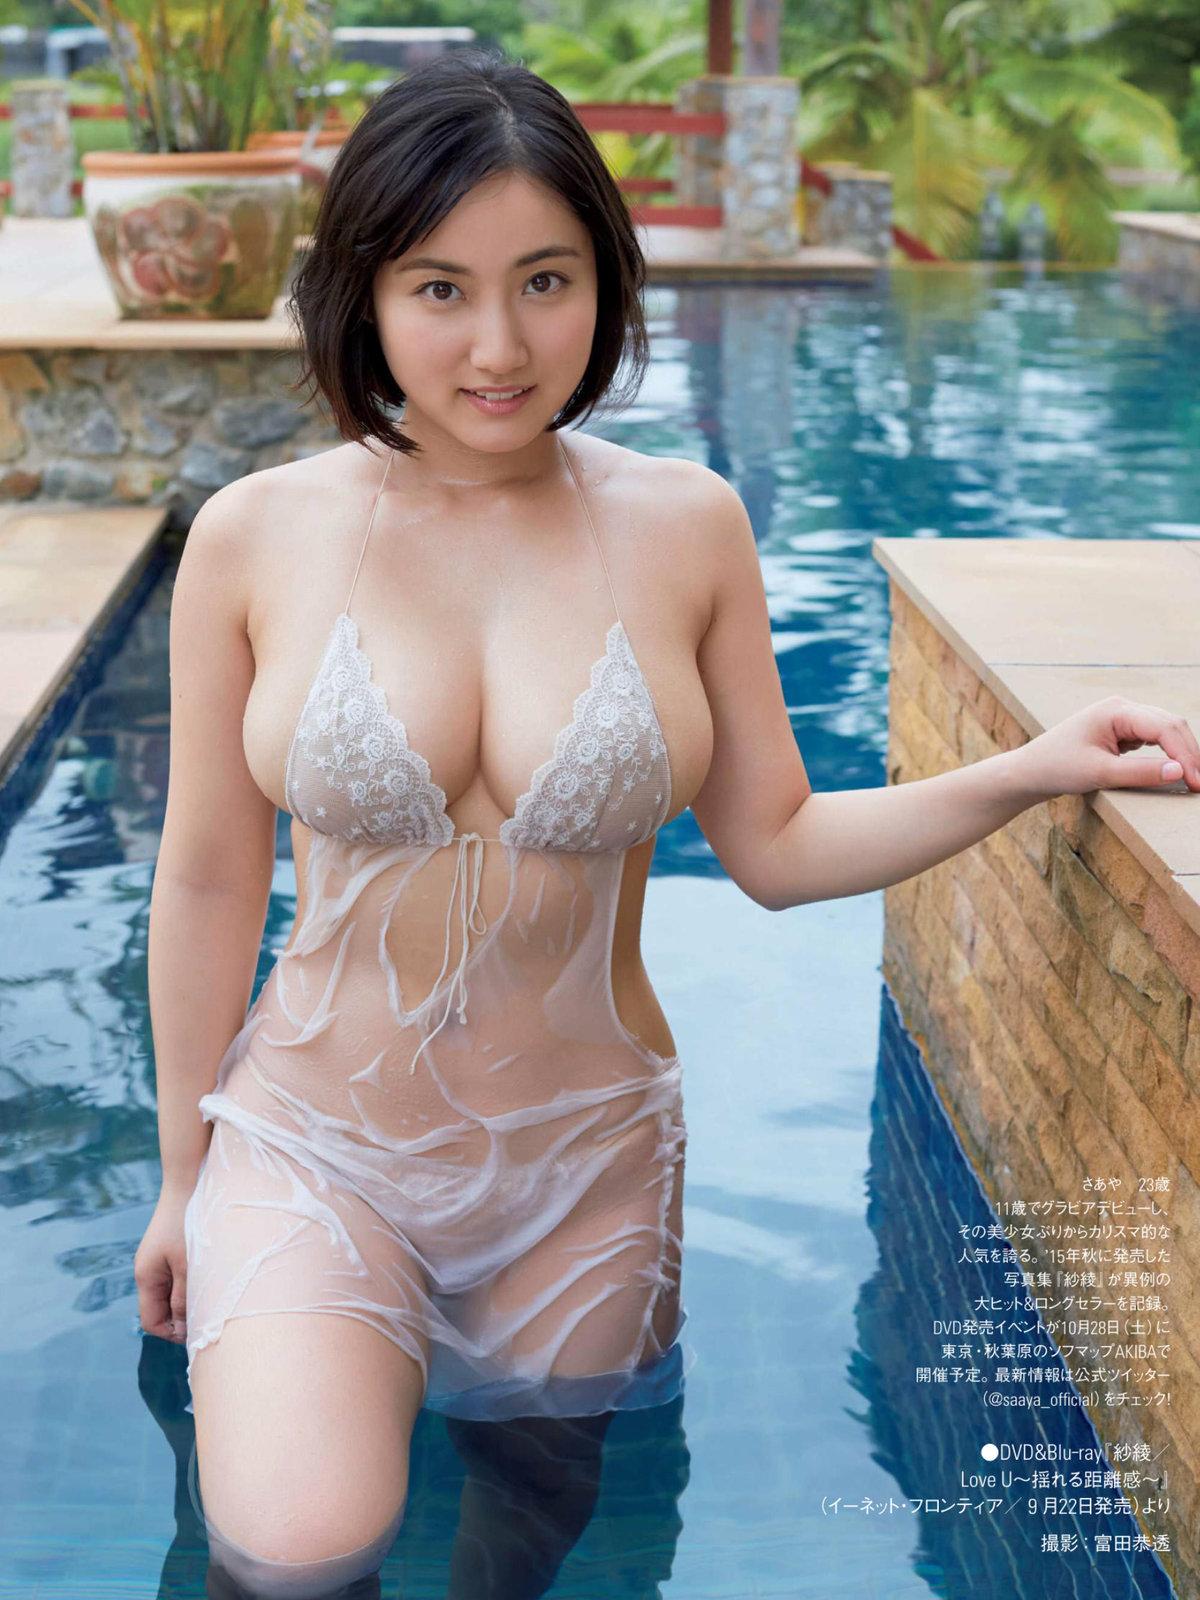 Saaya 紗綾, FRIDAY 2017.09.15 (フライデー 2017年09月15日号)